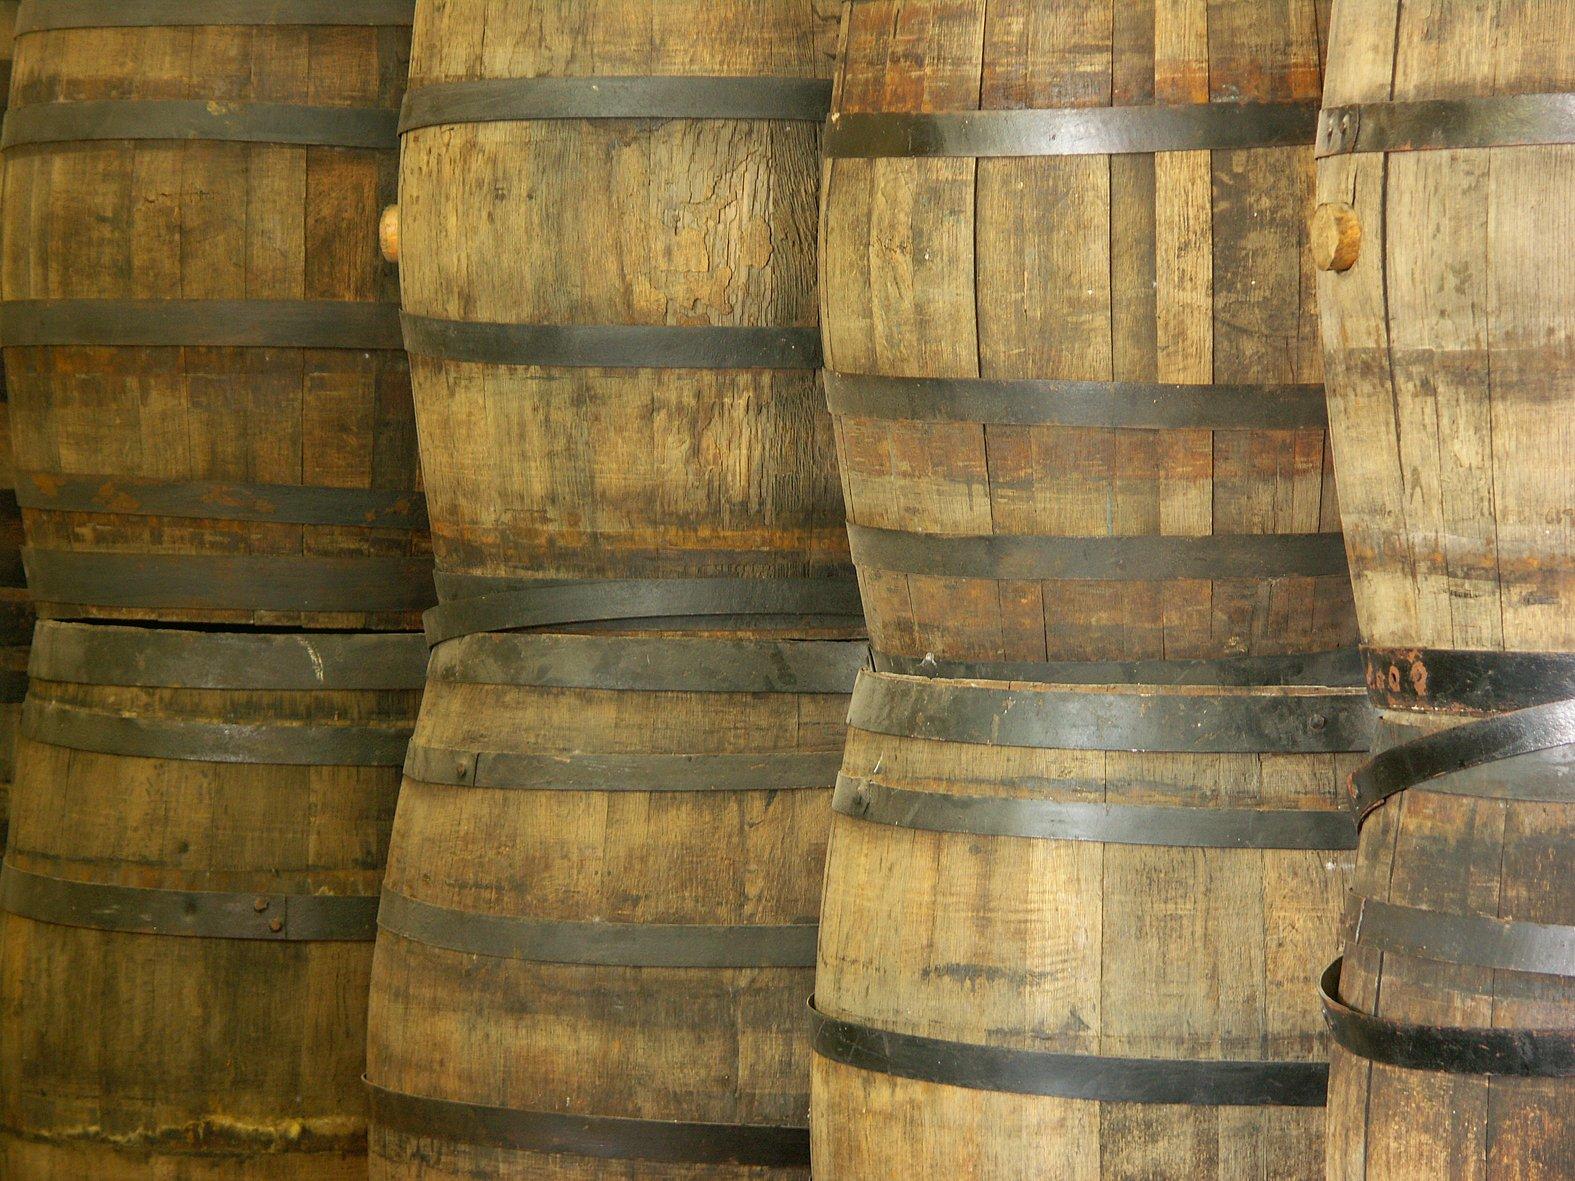 Free wine barrel 2 Stock Photo - FreeImages com